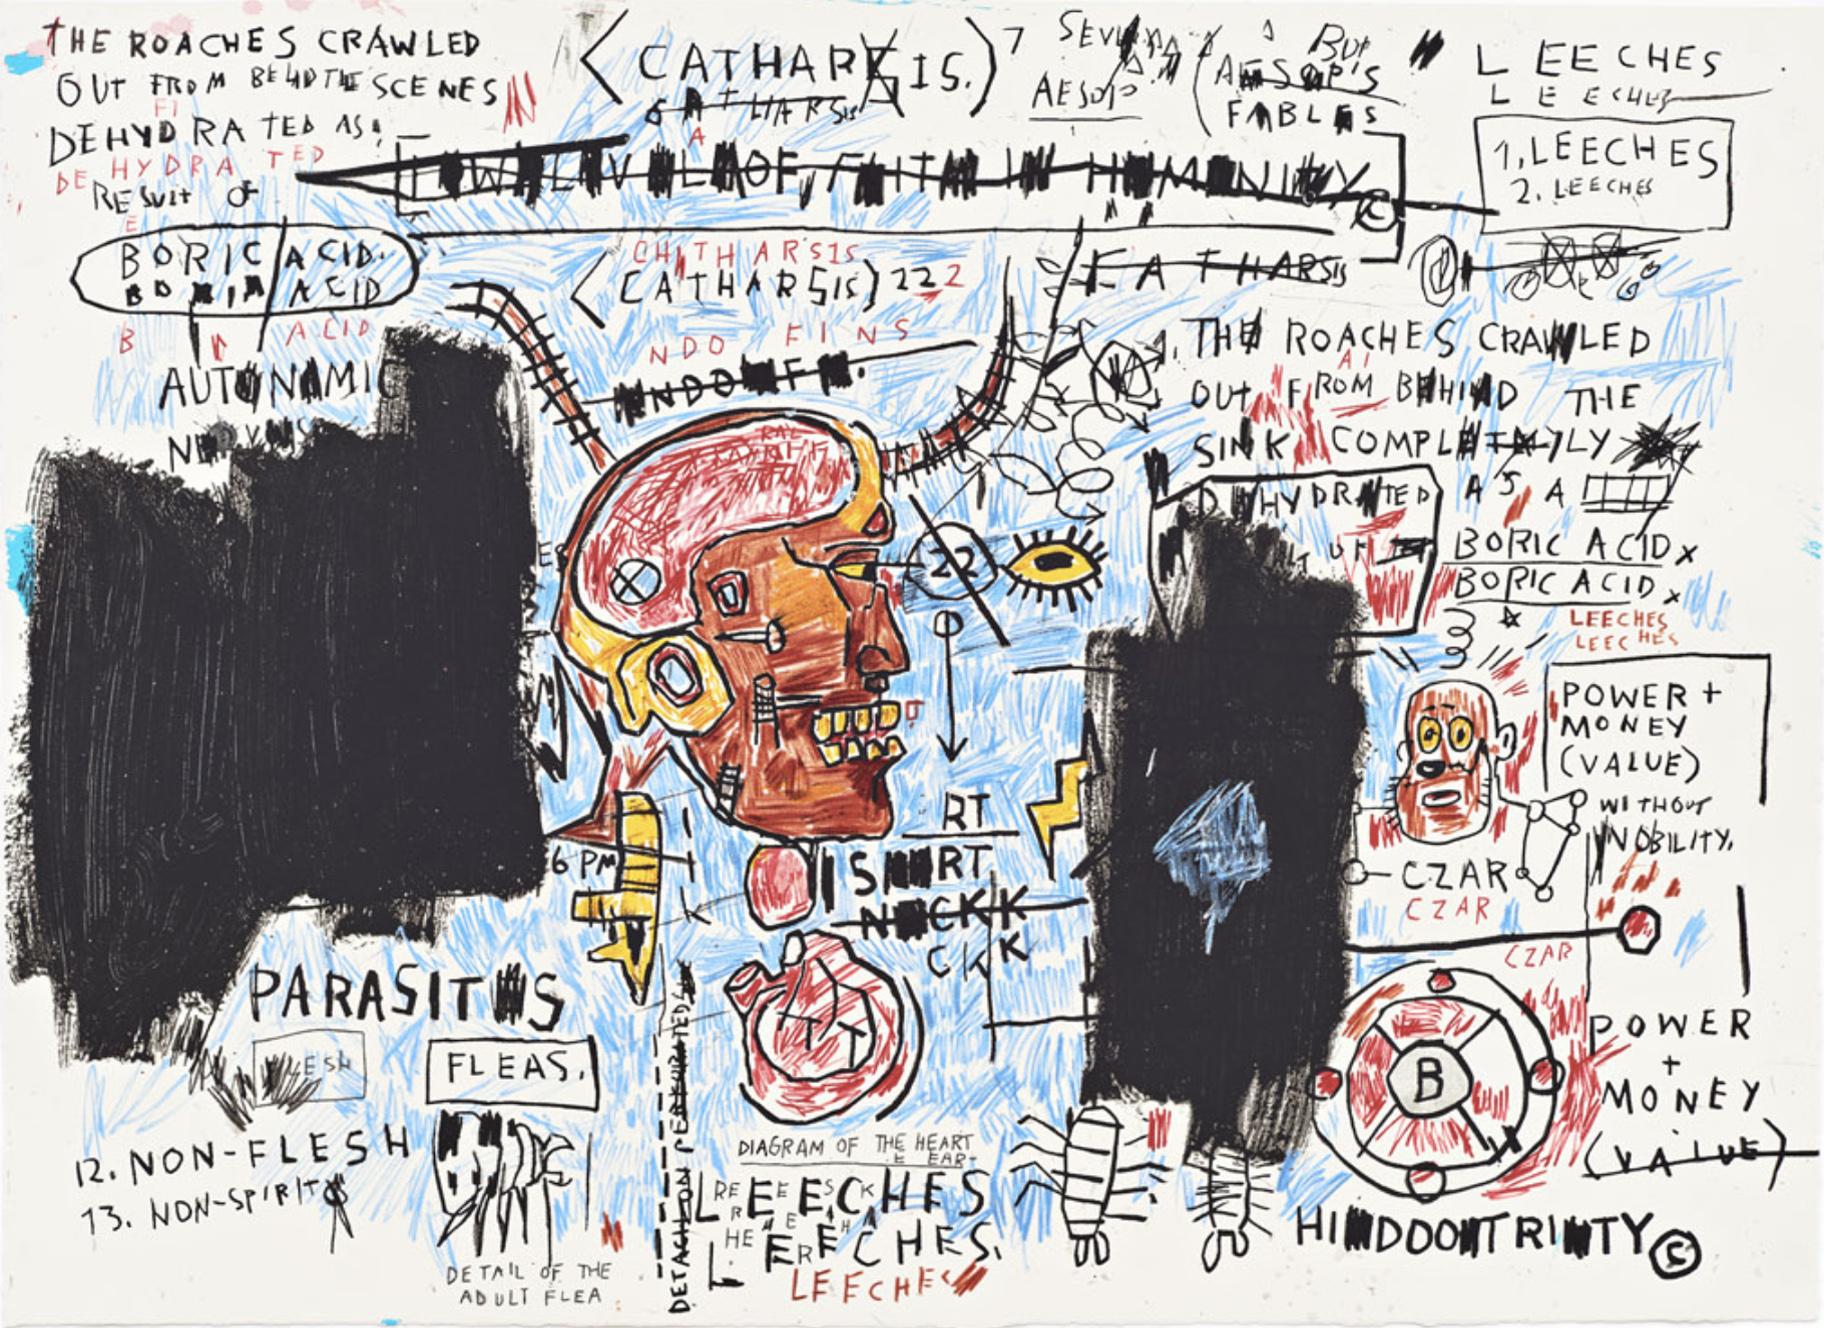 Leeches by Basquiat